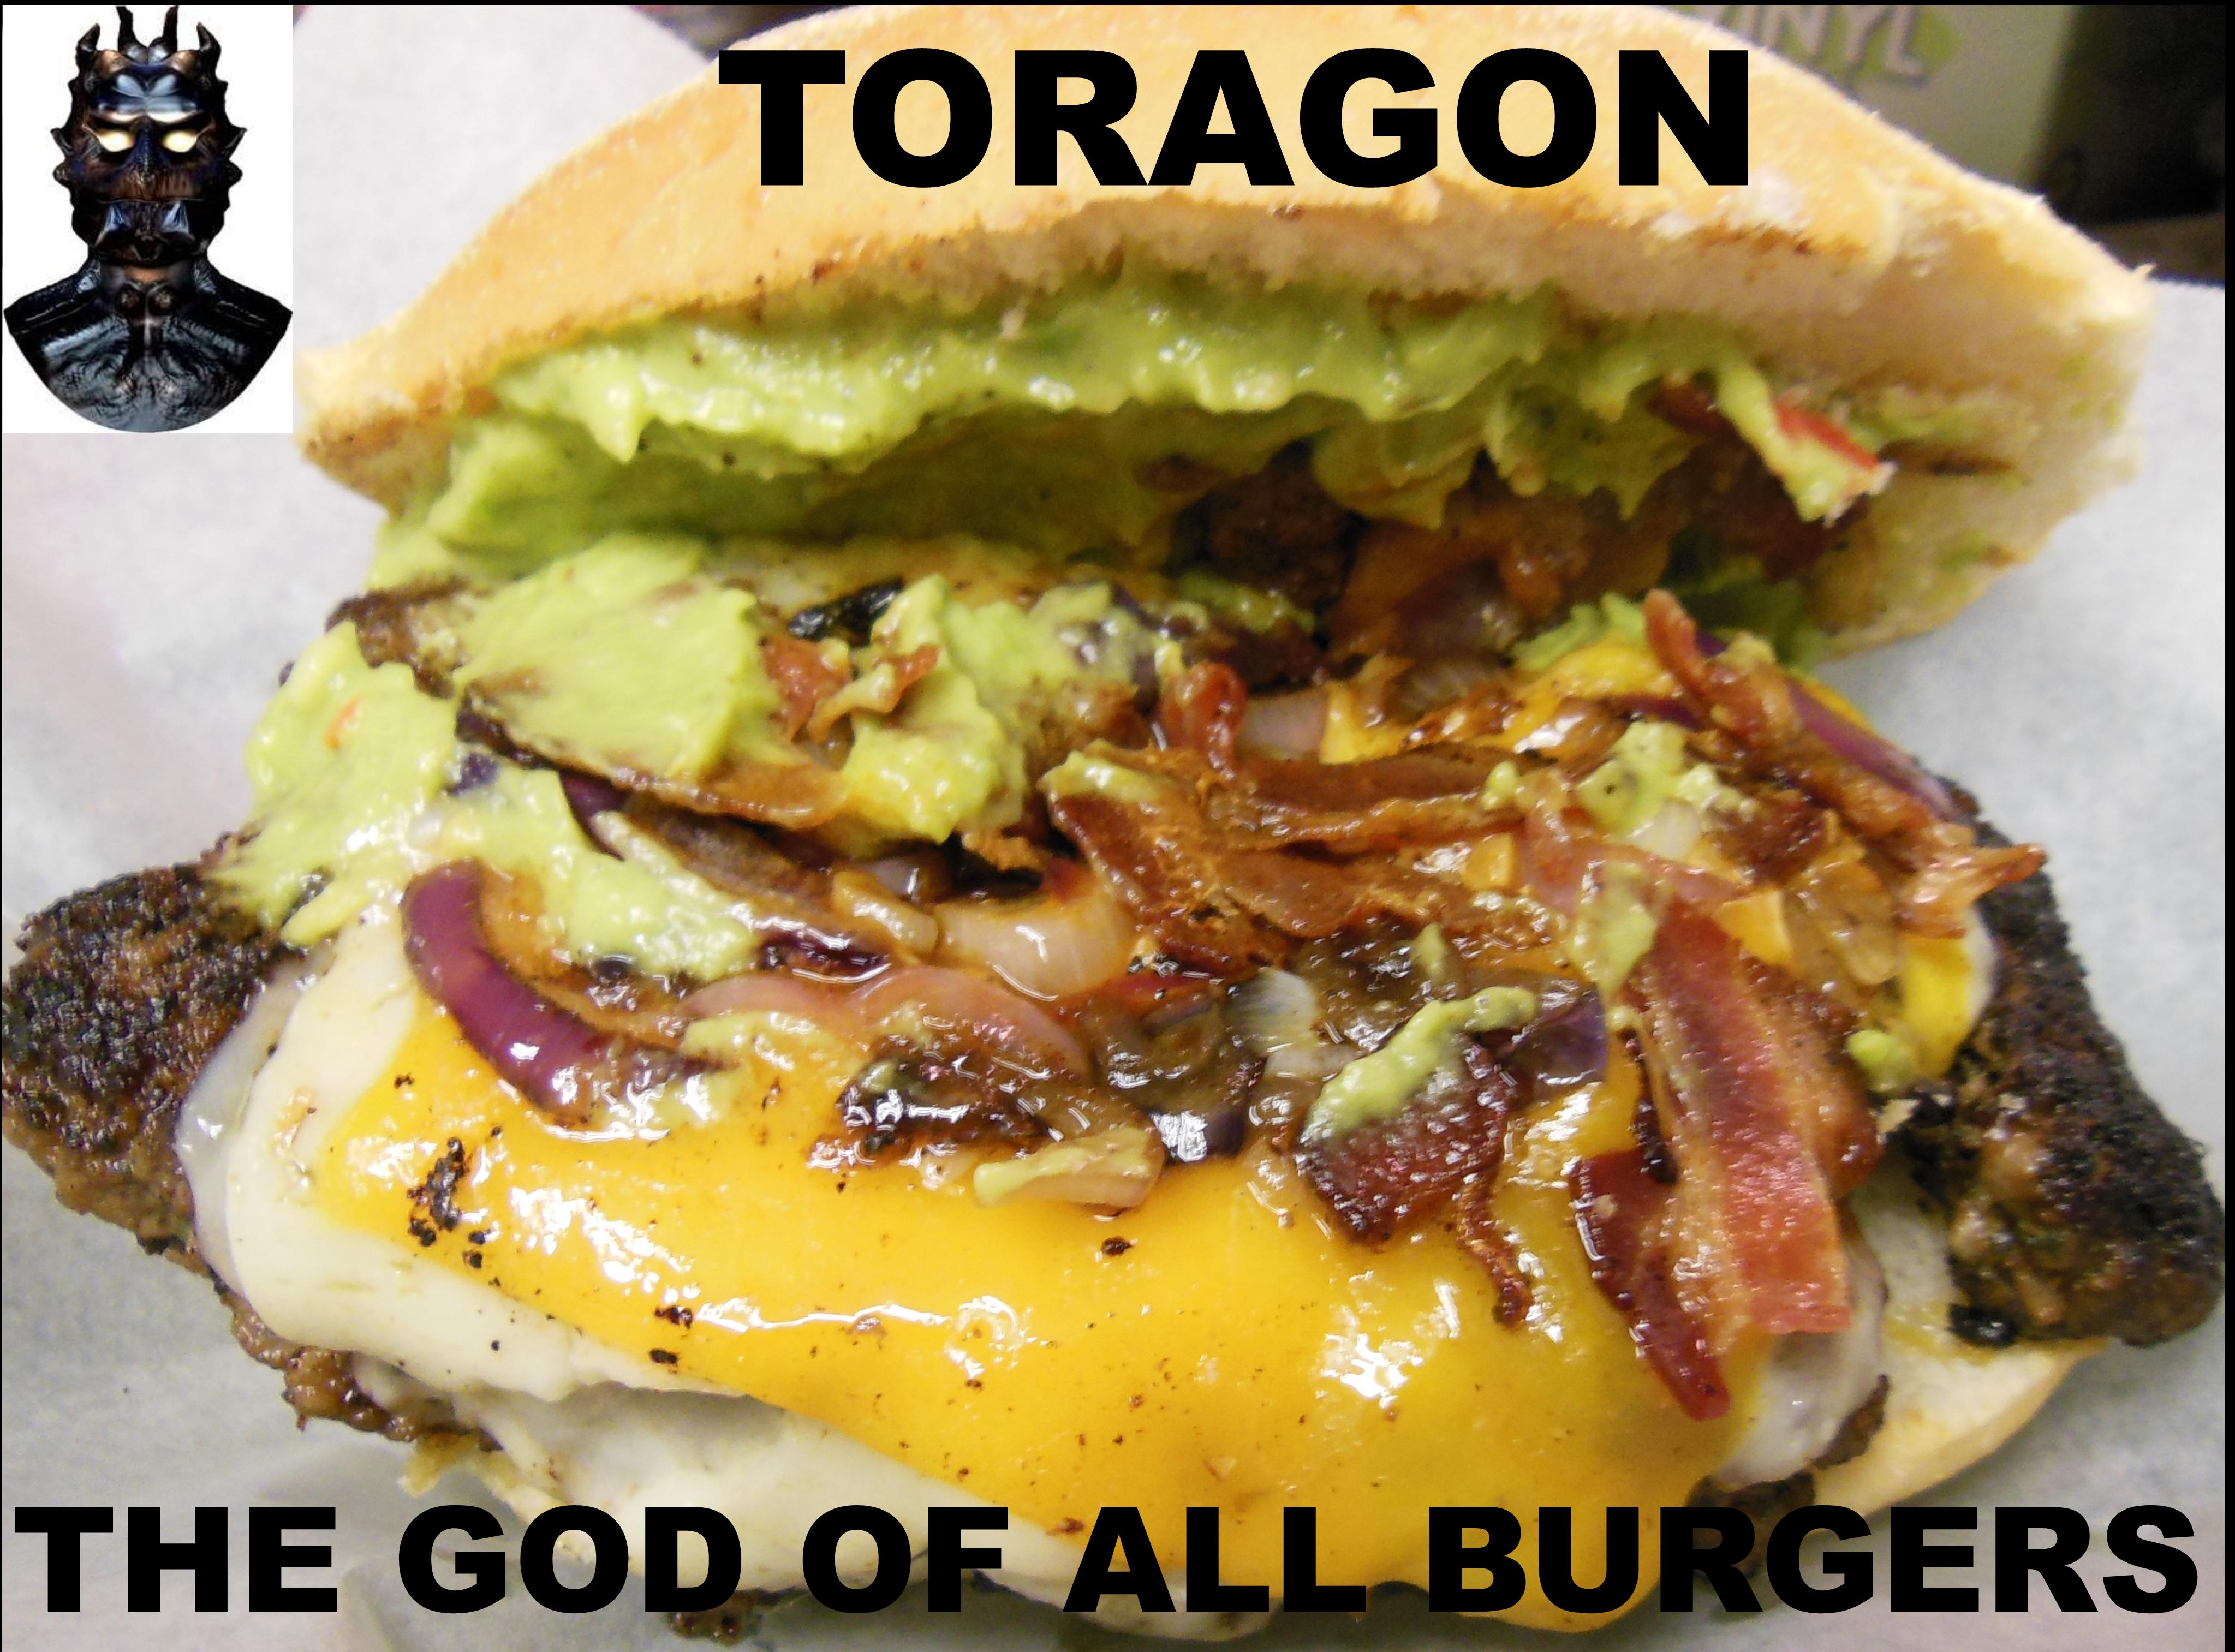 TORGON BIG MAGNET